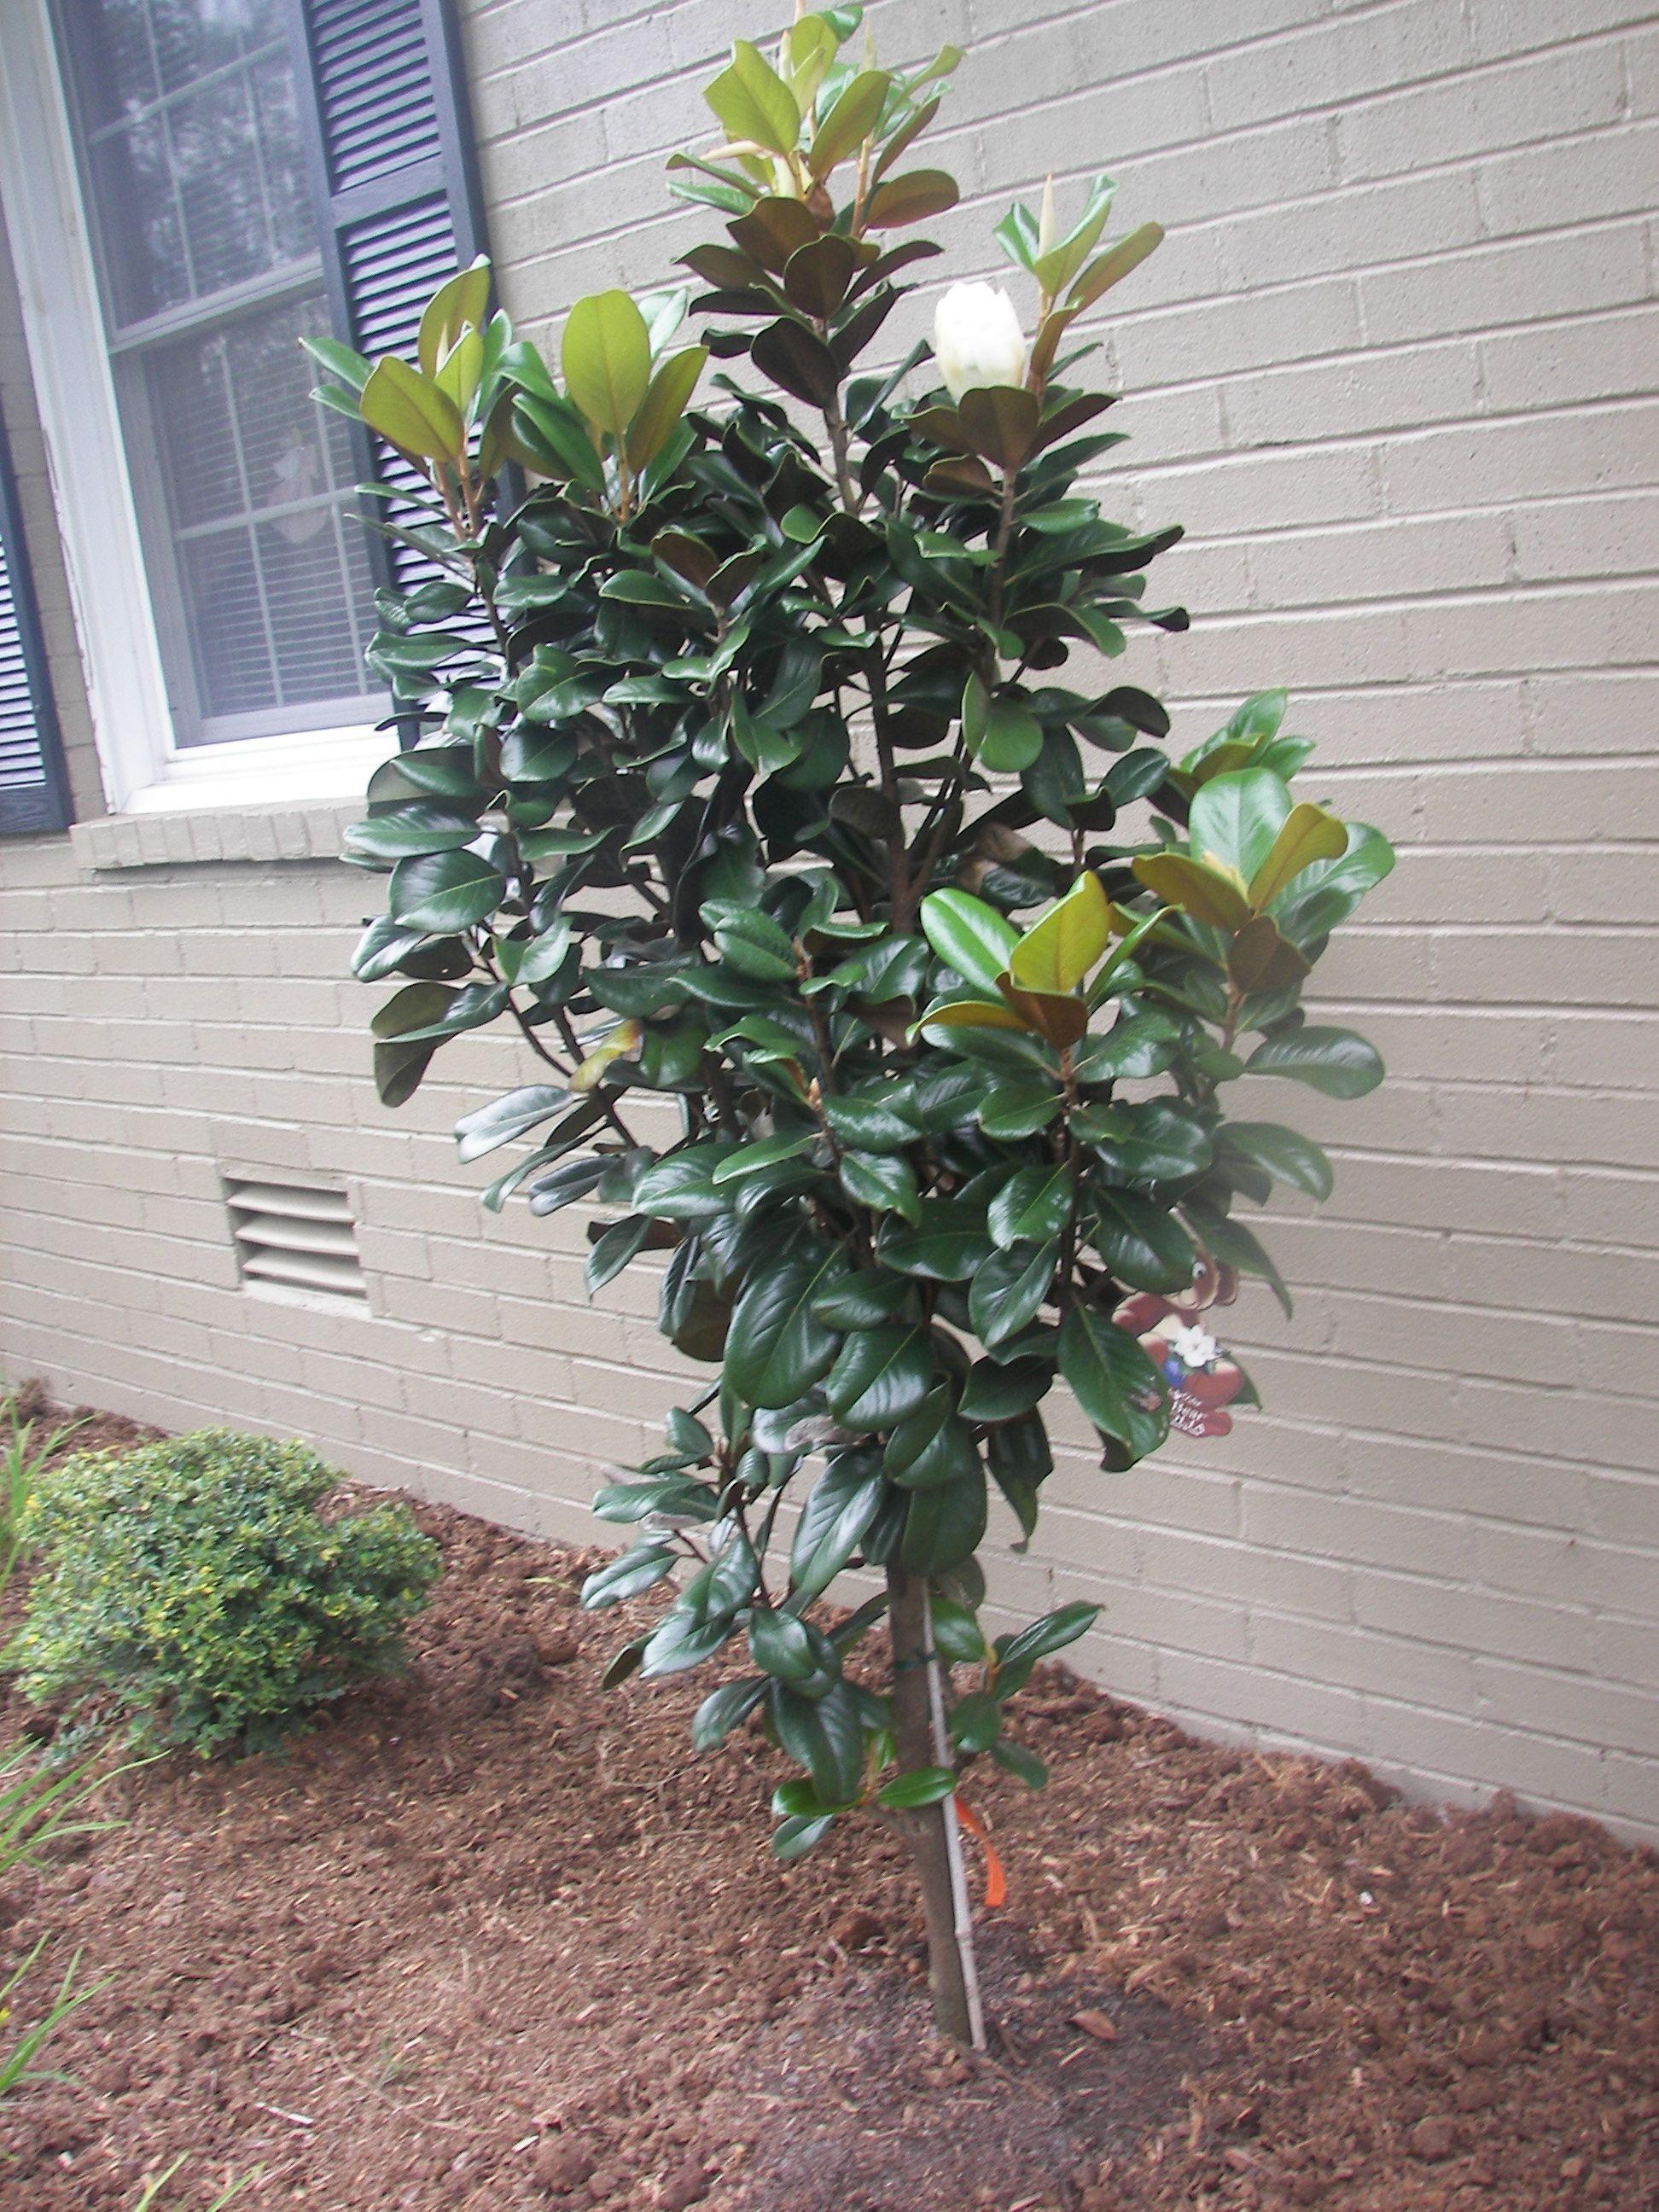 Teddy Bear Dwarf Magnolia Tree | Patio Plants | Pinterest | Dwarf Magnolia,  Magnolia Trees And Dwarf